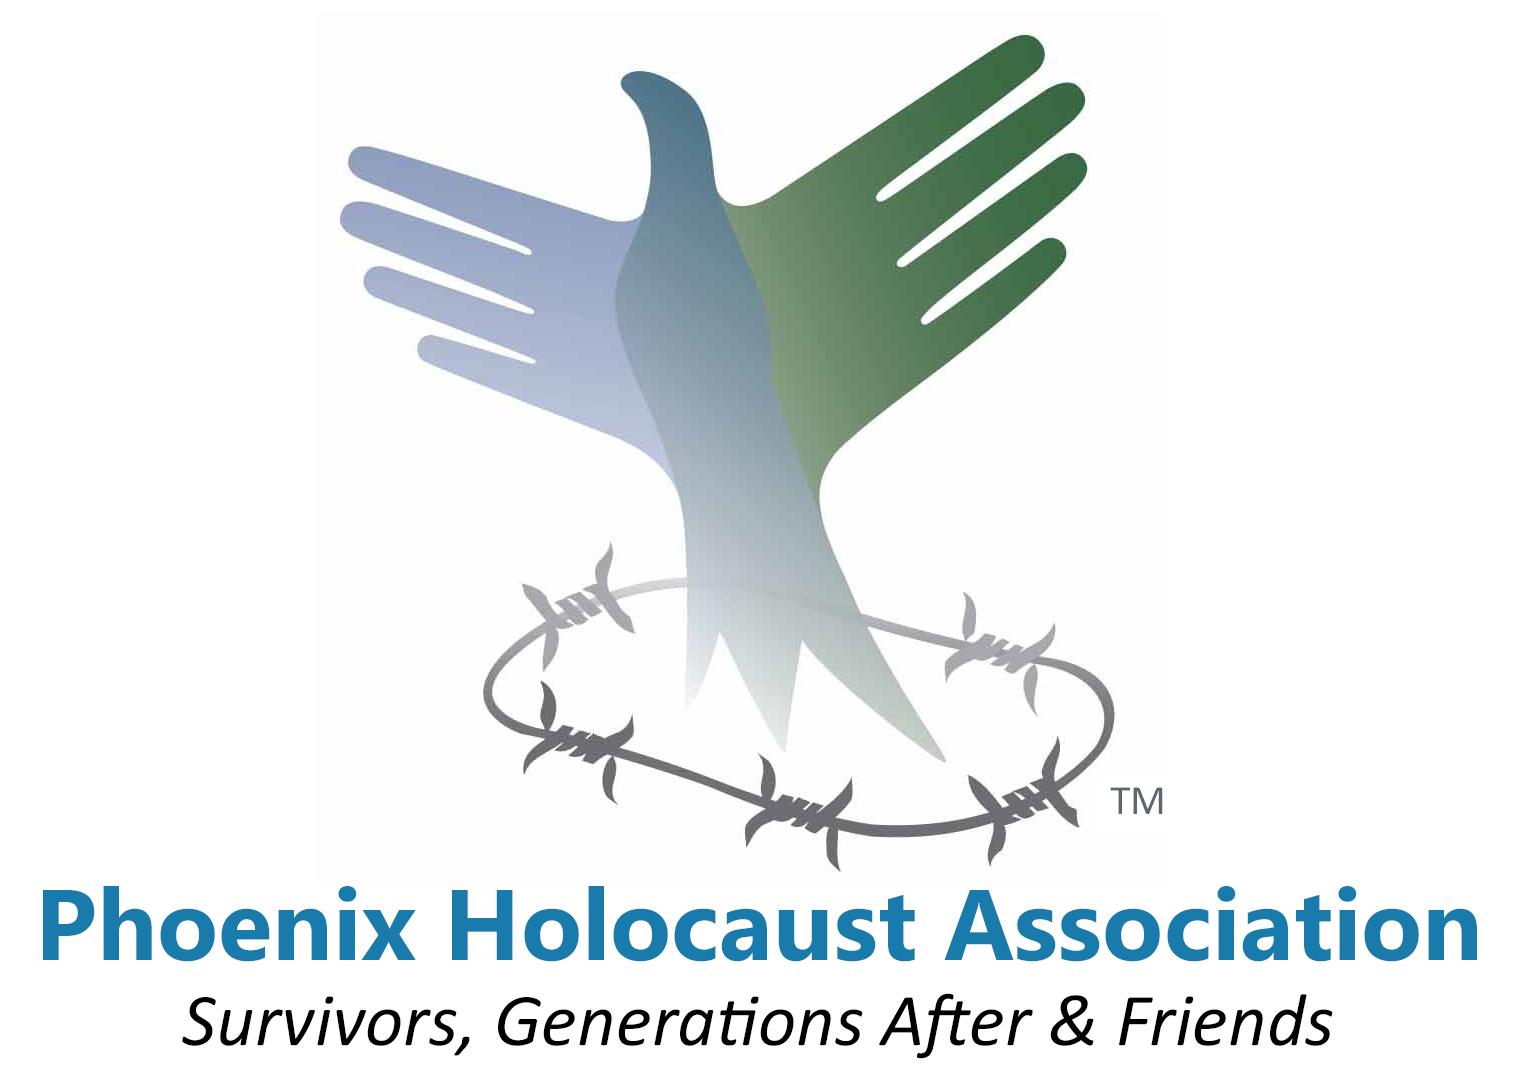 Pheonix Holocaust Association Logo 2.png